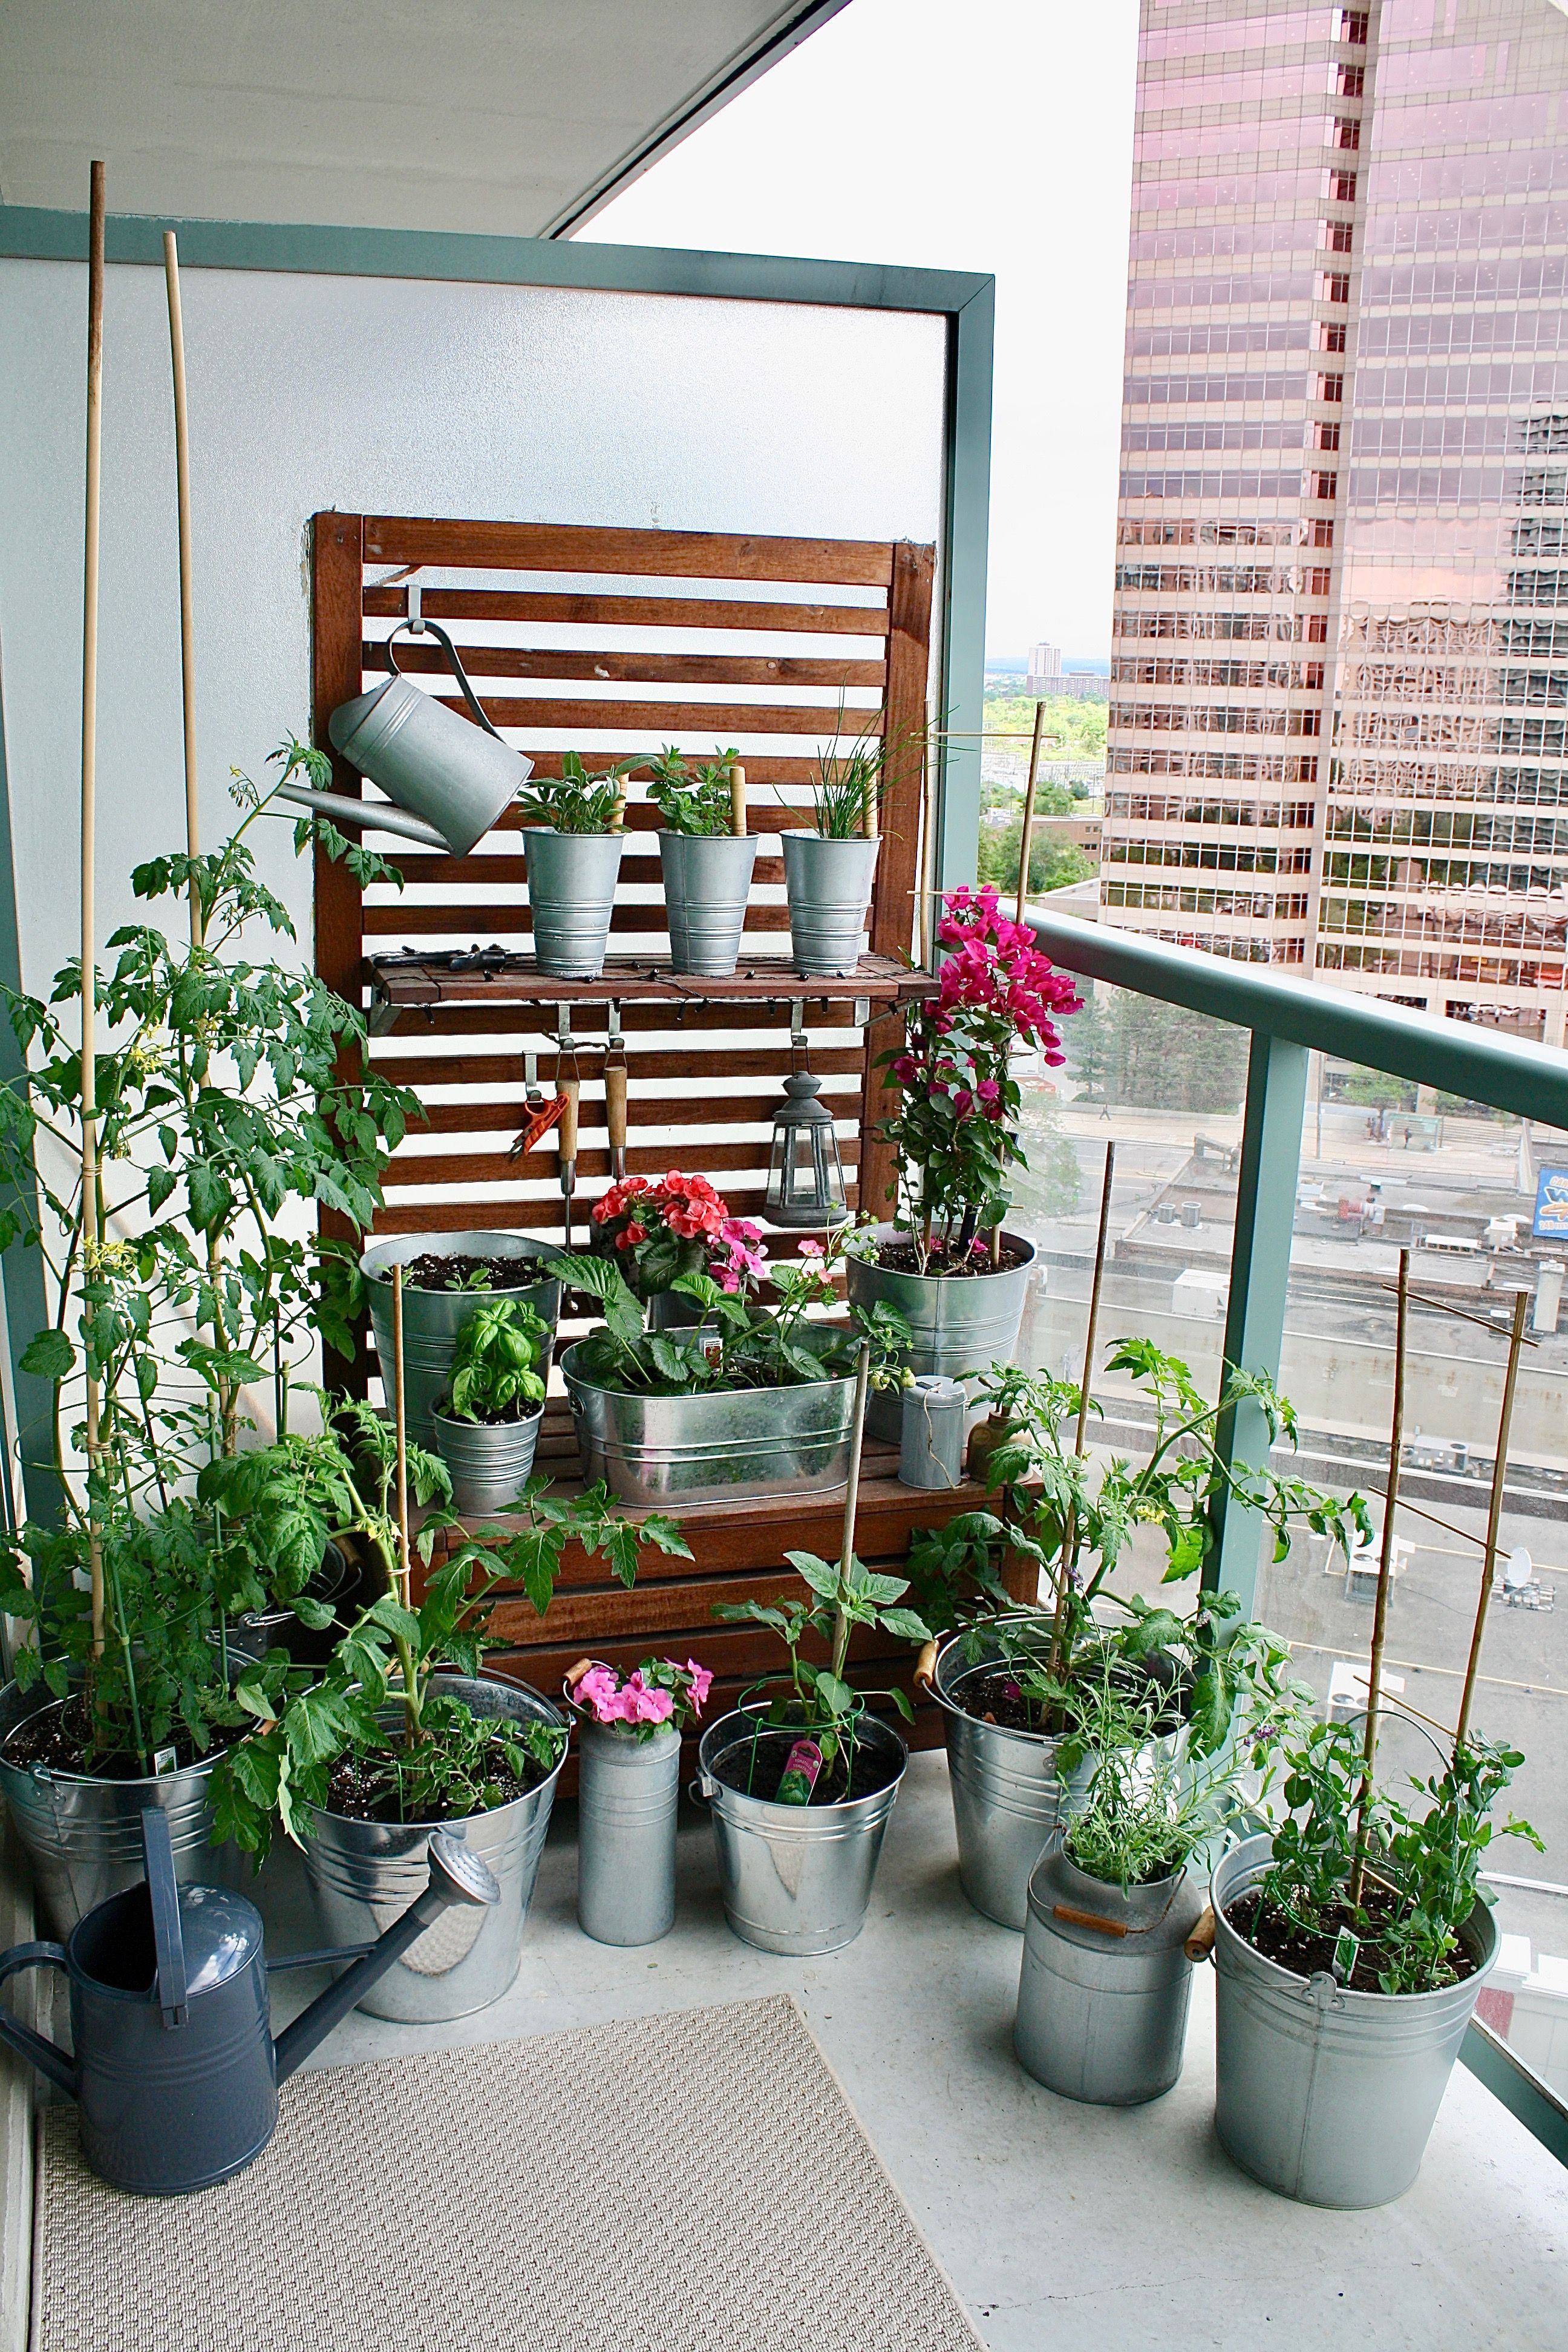 My Balcony Garden #gardening #garden #DIY #home #flowers #roses ...